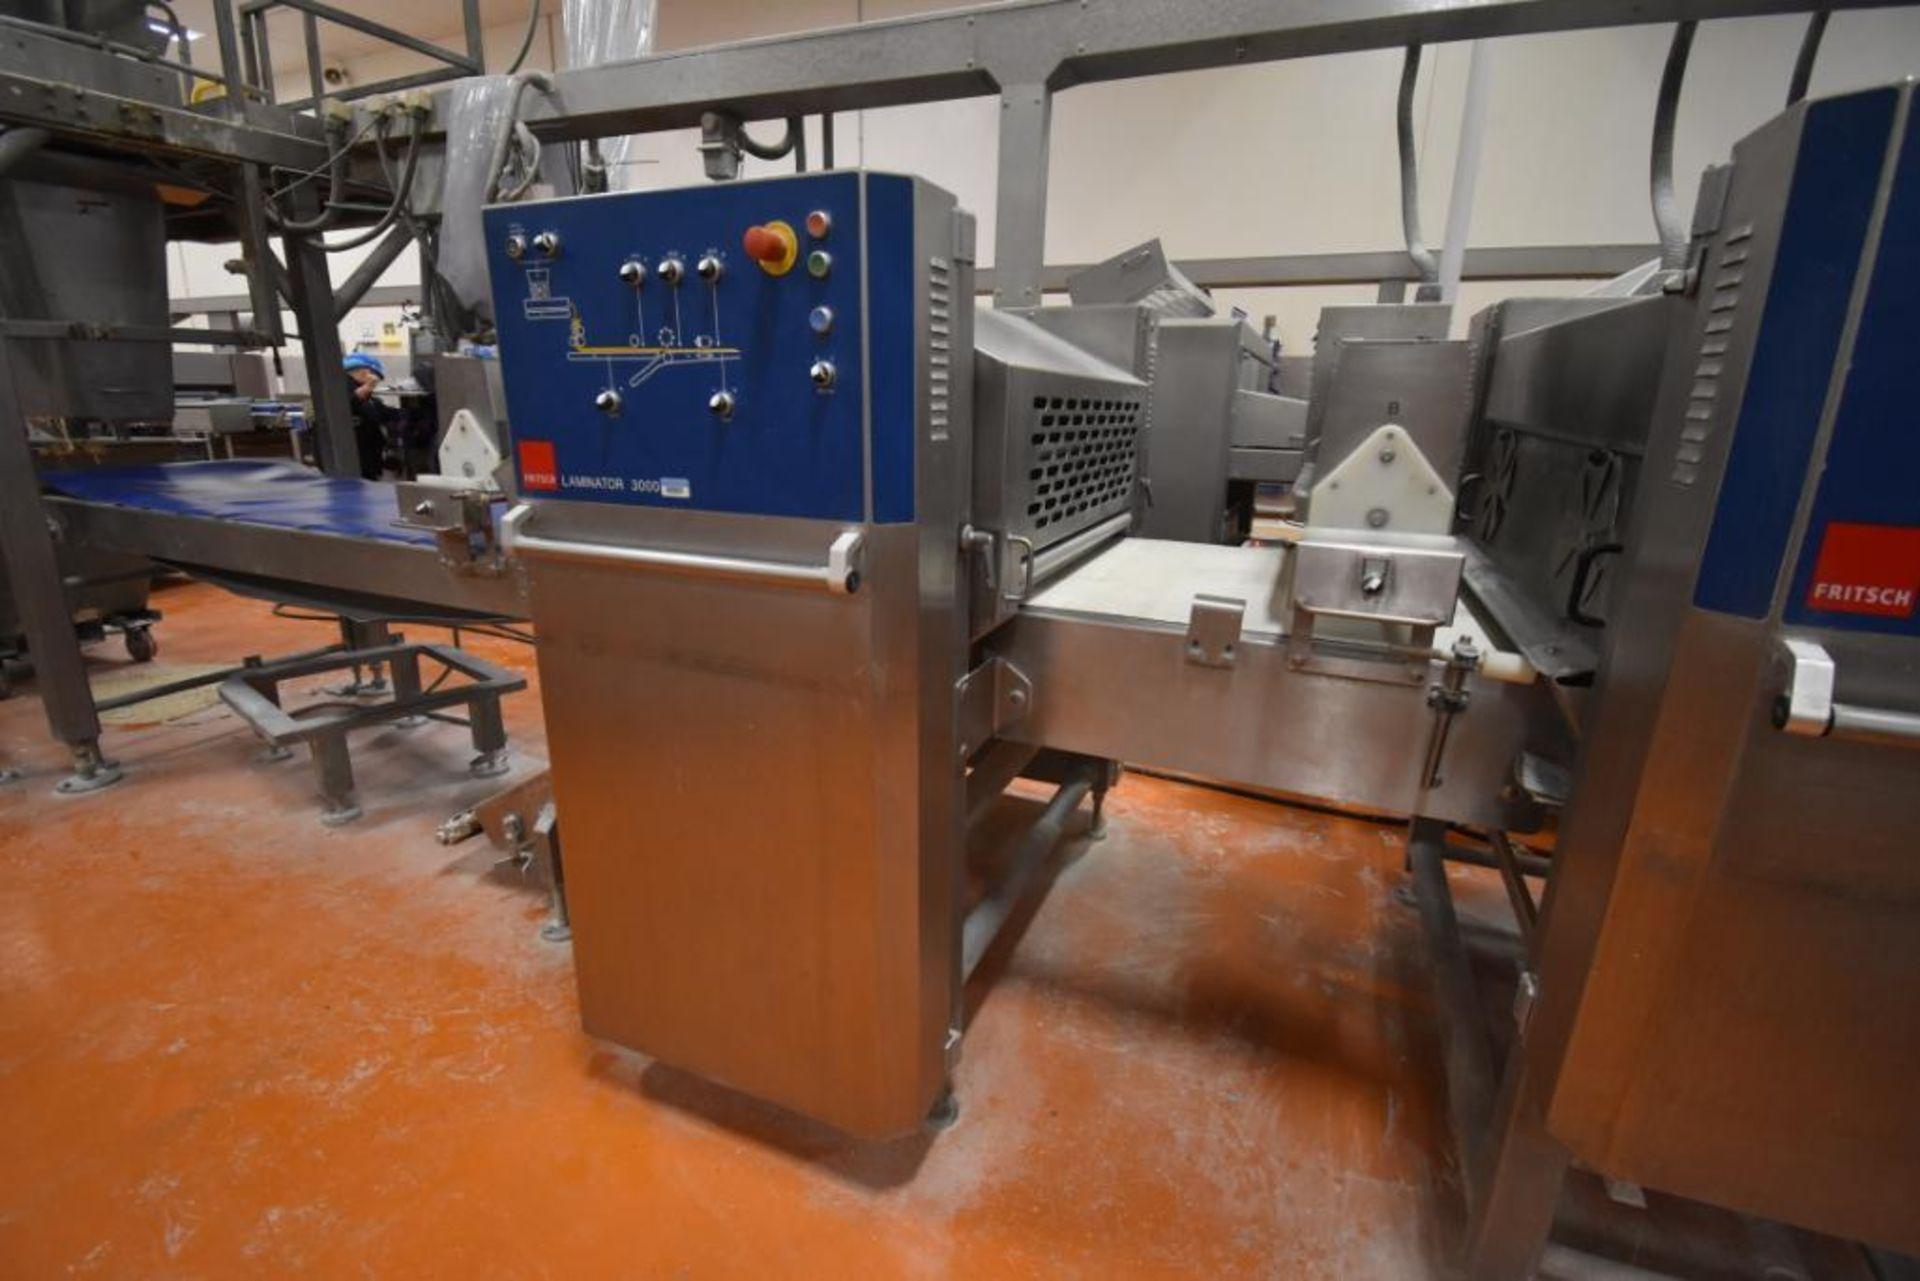 2007 Fritsch Laminator 3000 dough line - Image 63 of 280